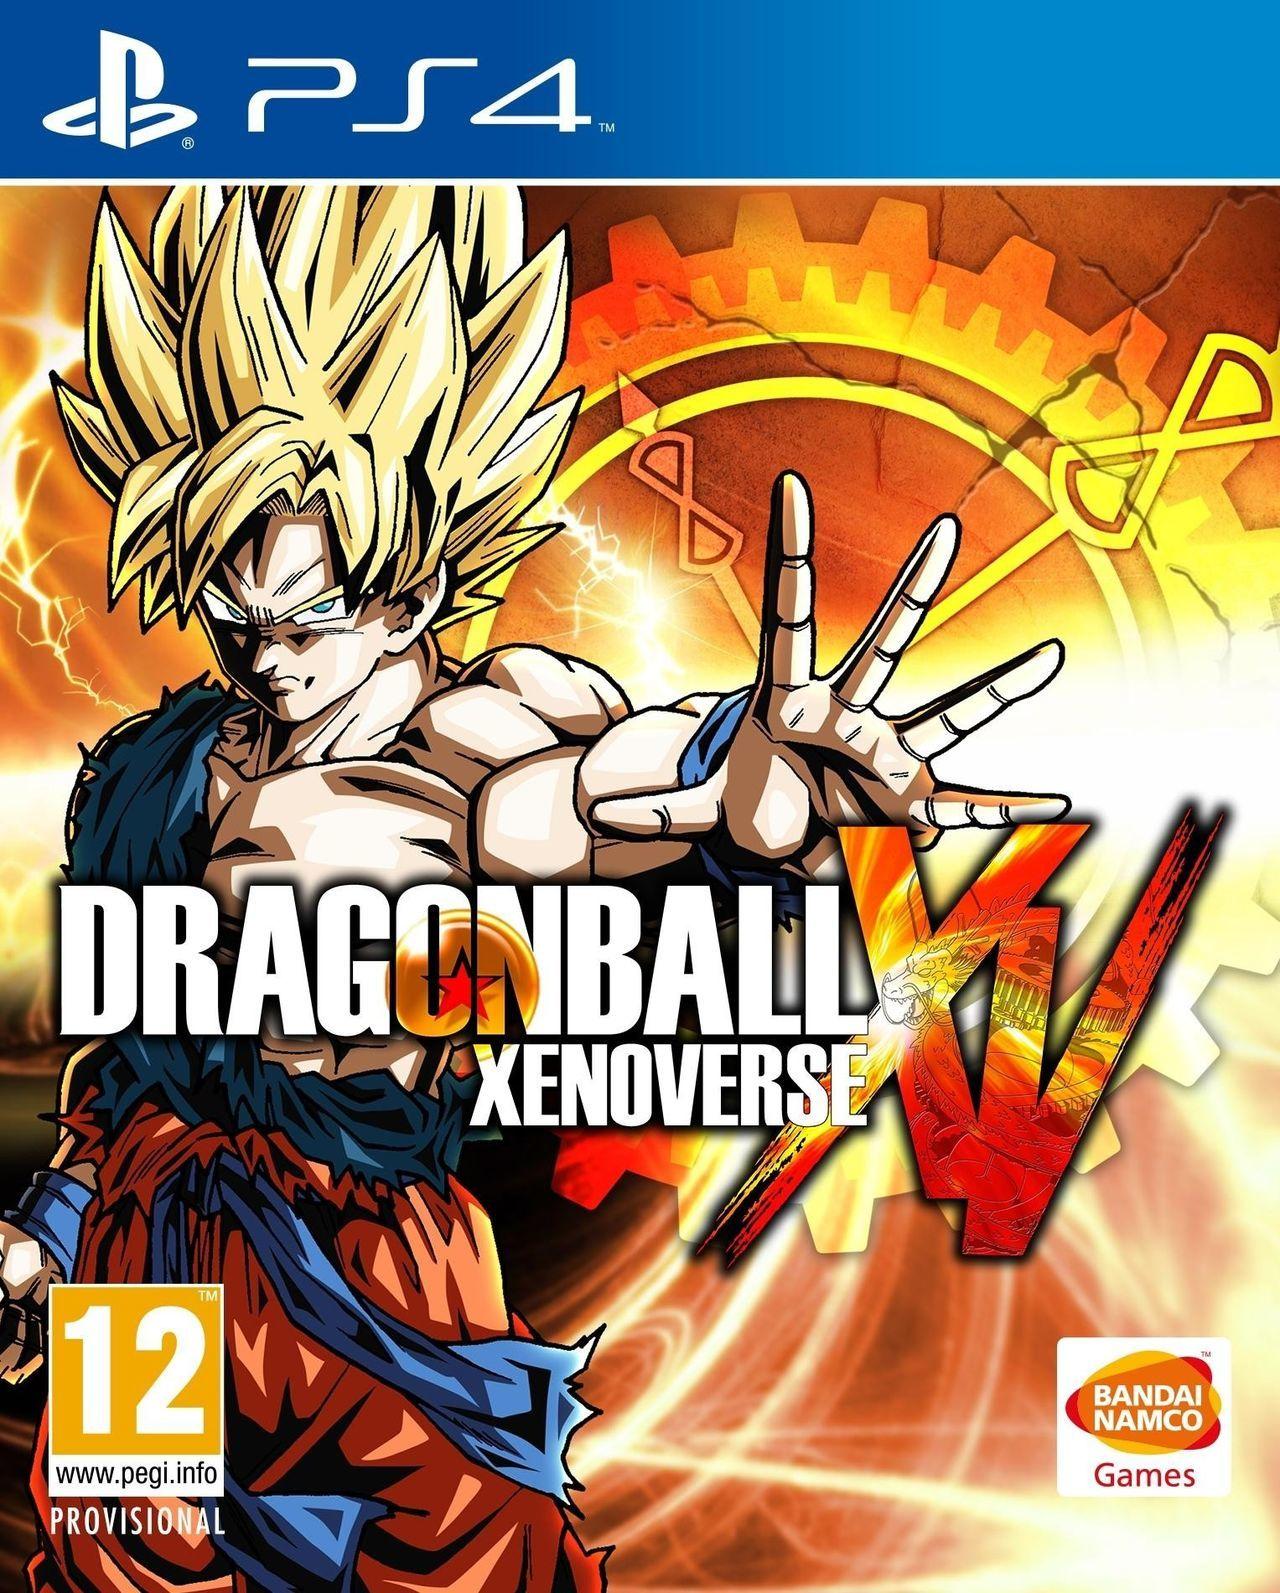 Dragon Ball Xenoverse Toda La Informacion Ps4 Ps3 Pc Xbox 360